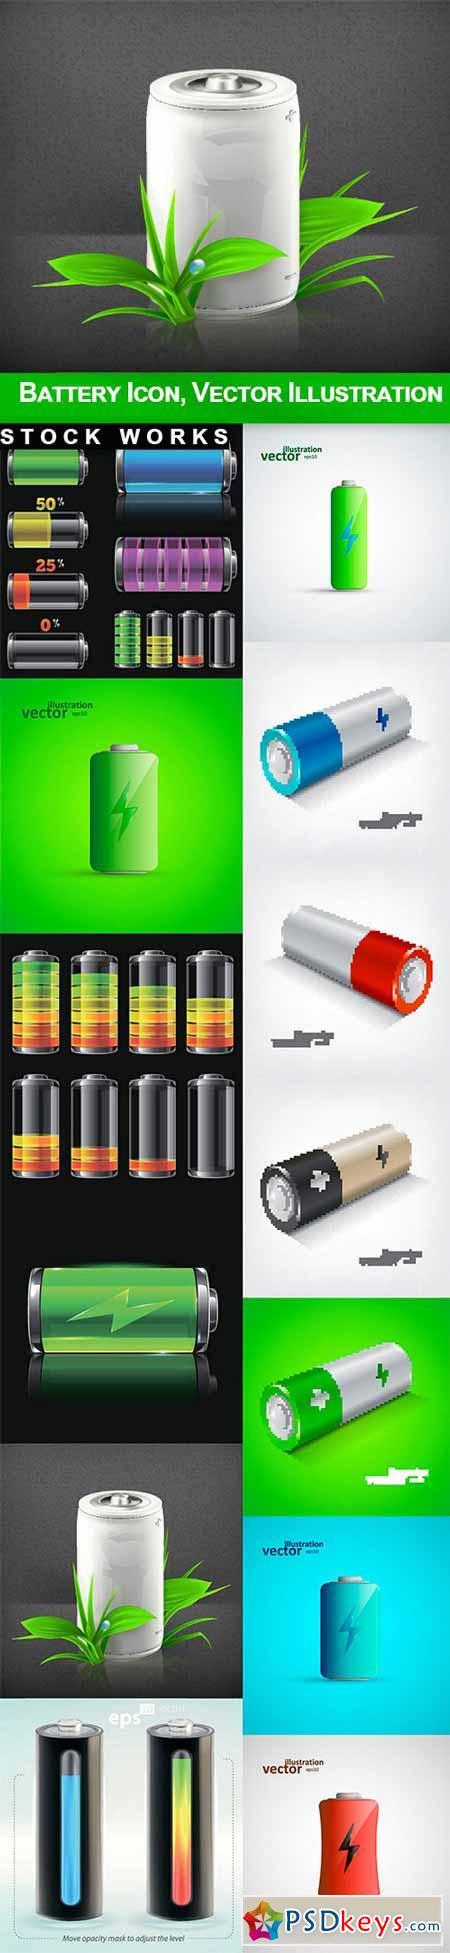 Battery Icon, Vector Illustration - 13 EPS